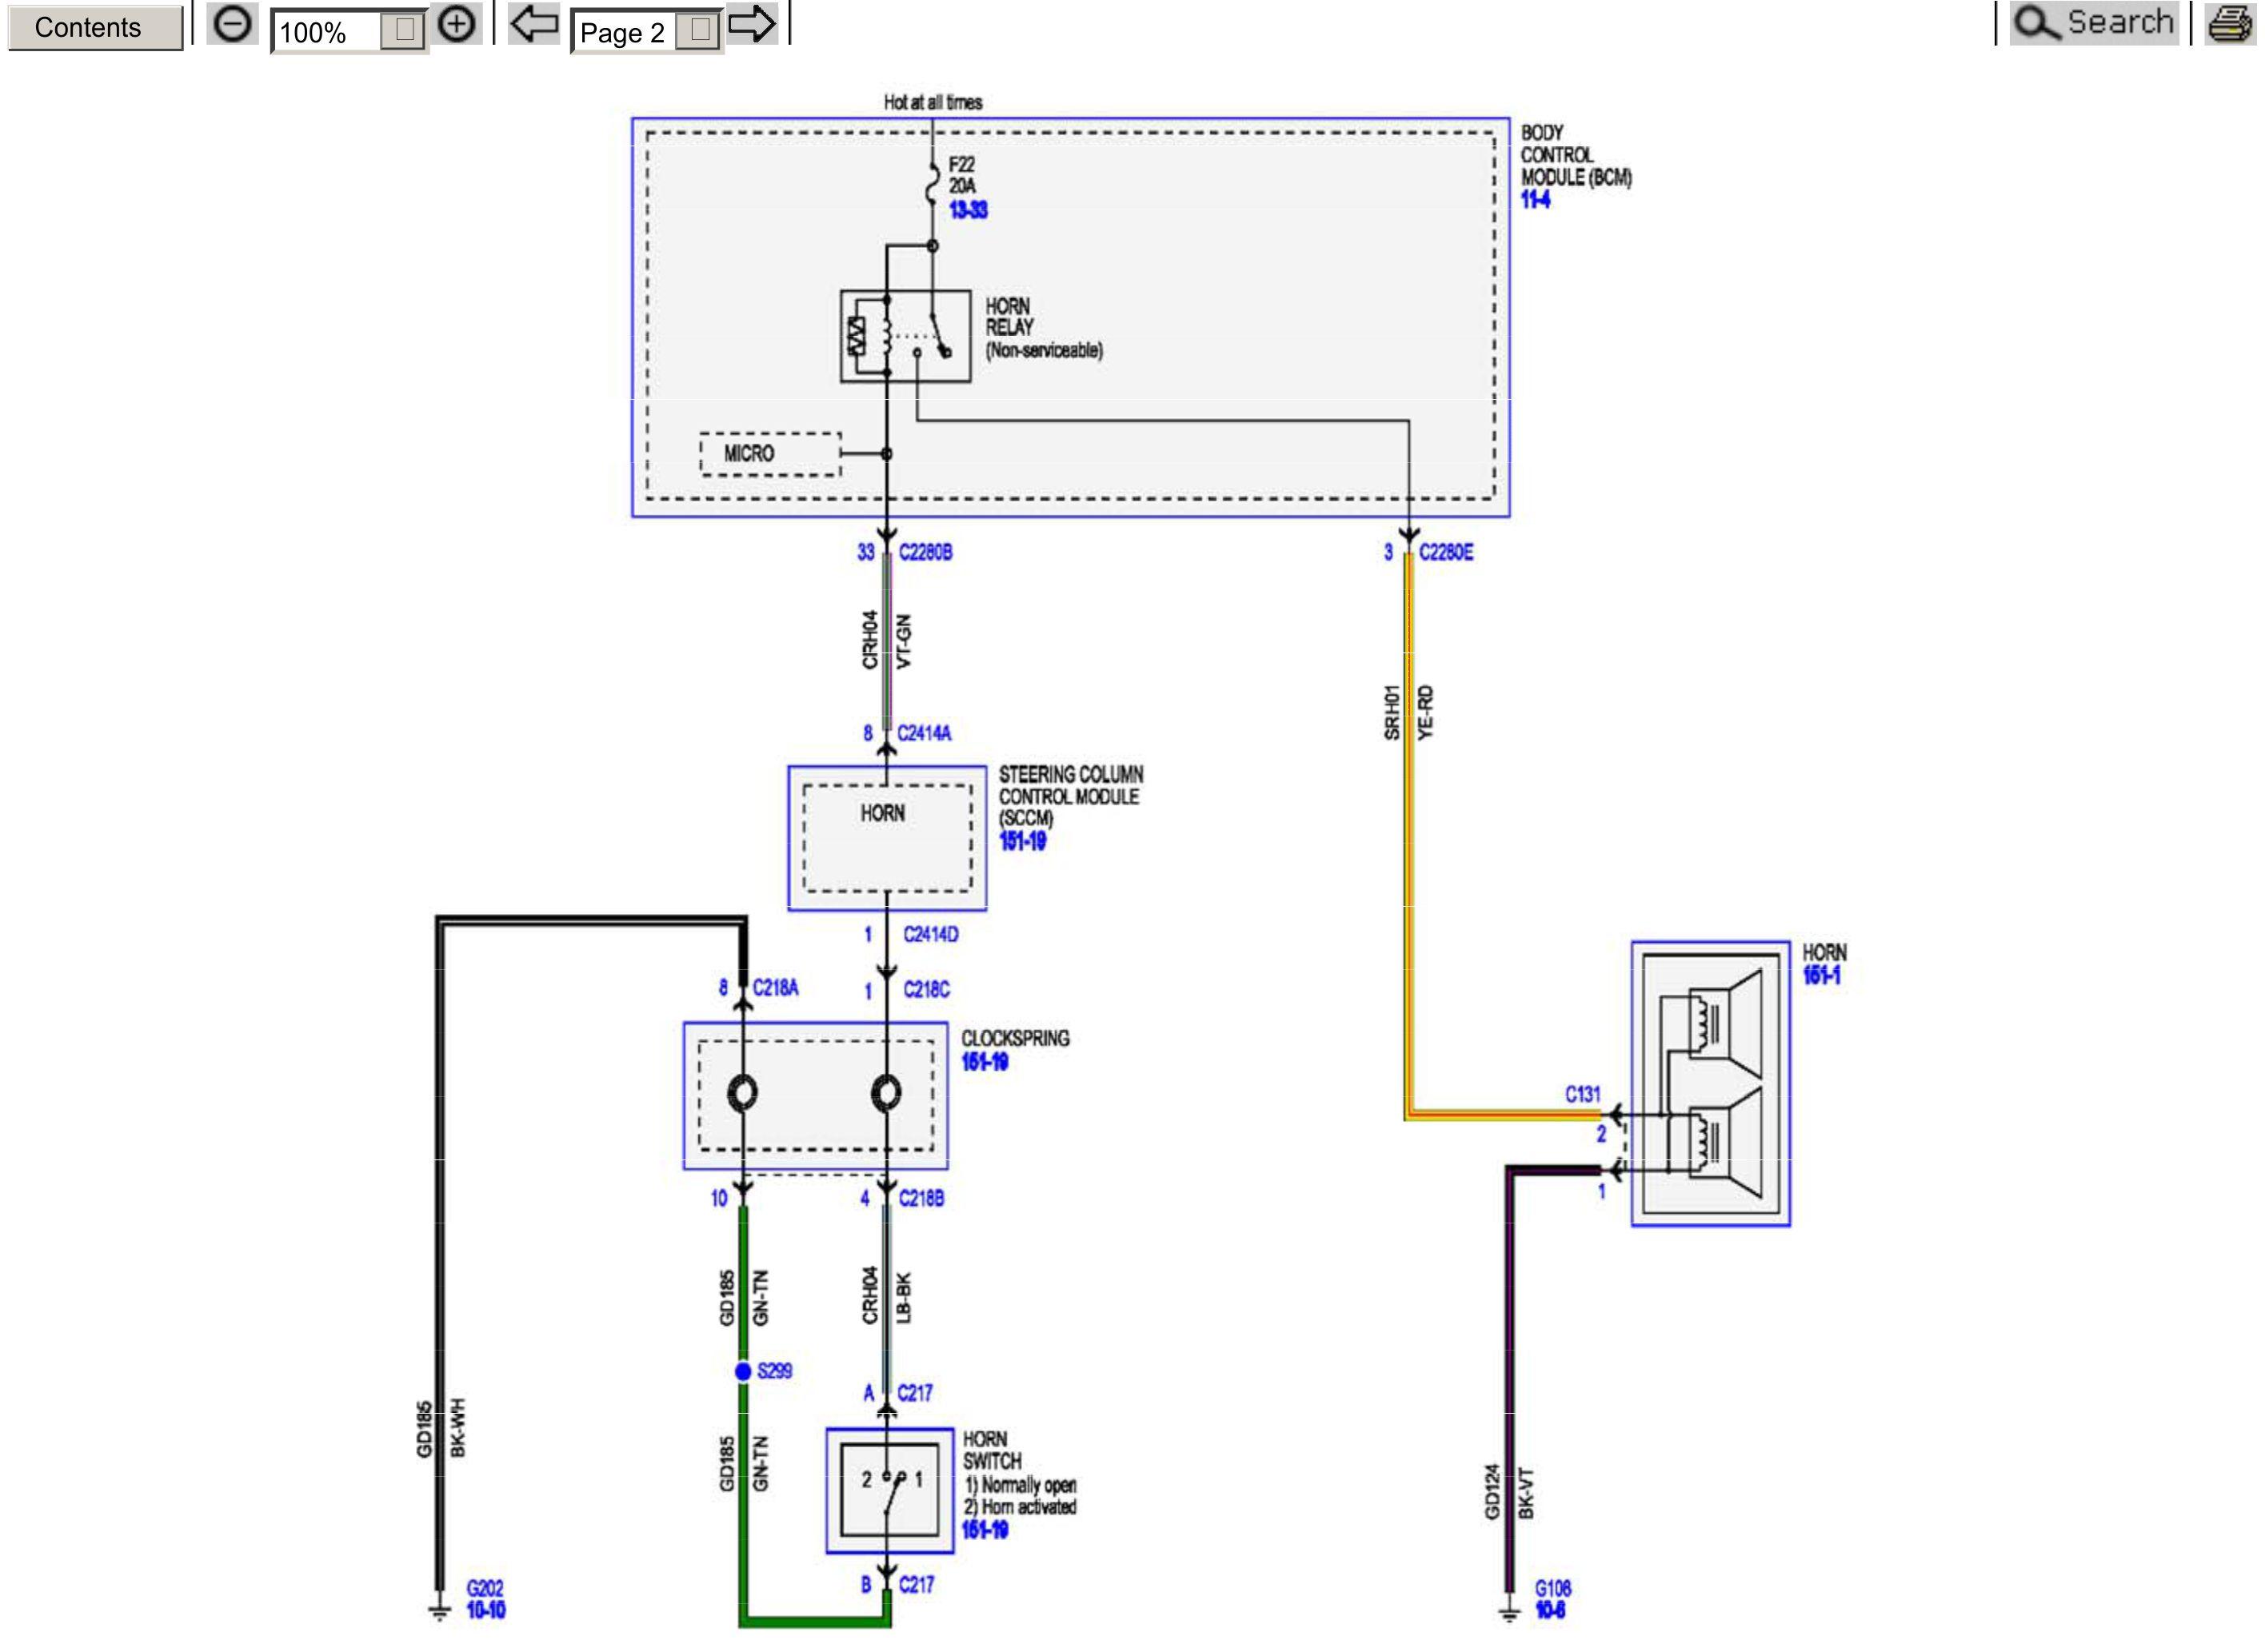 2015 Superduty Factory Horn Wiring Schematic | Ford Powerstroke Diesel Forum | 2015 Ford F 250 Wiring Schematic |  | Powerstroke.org